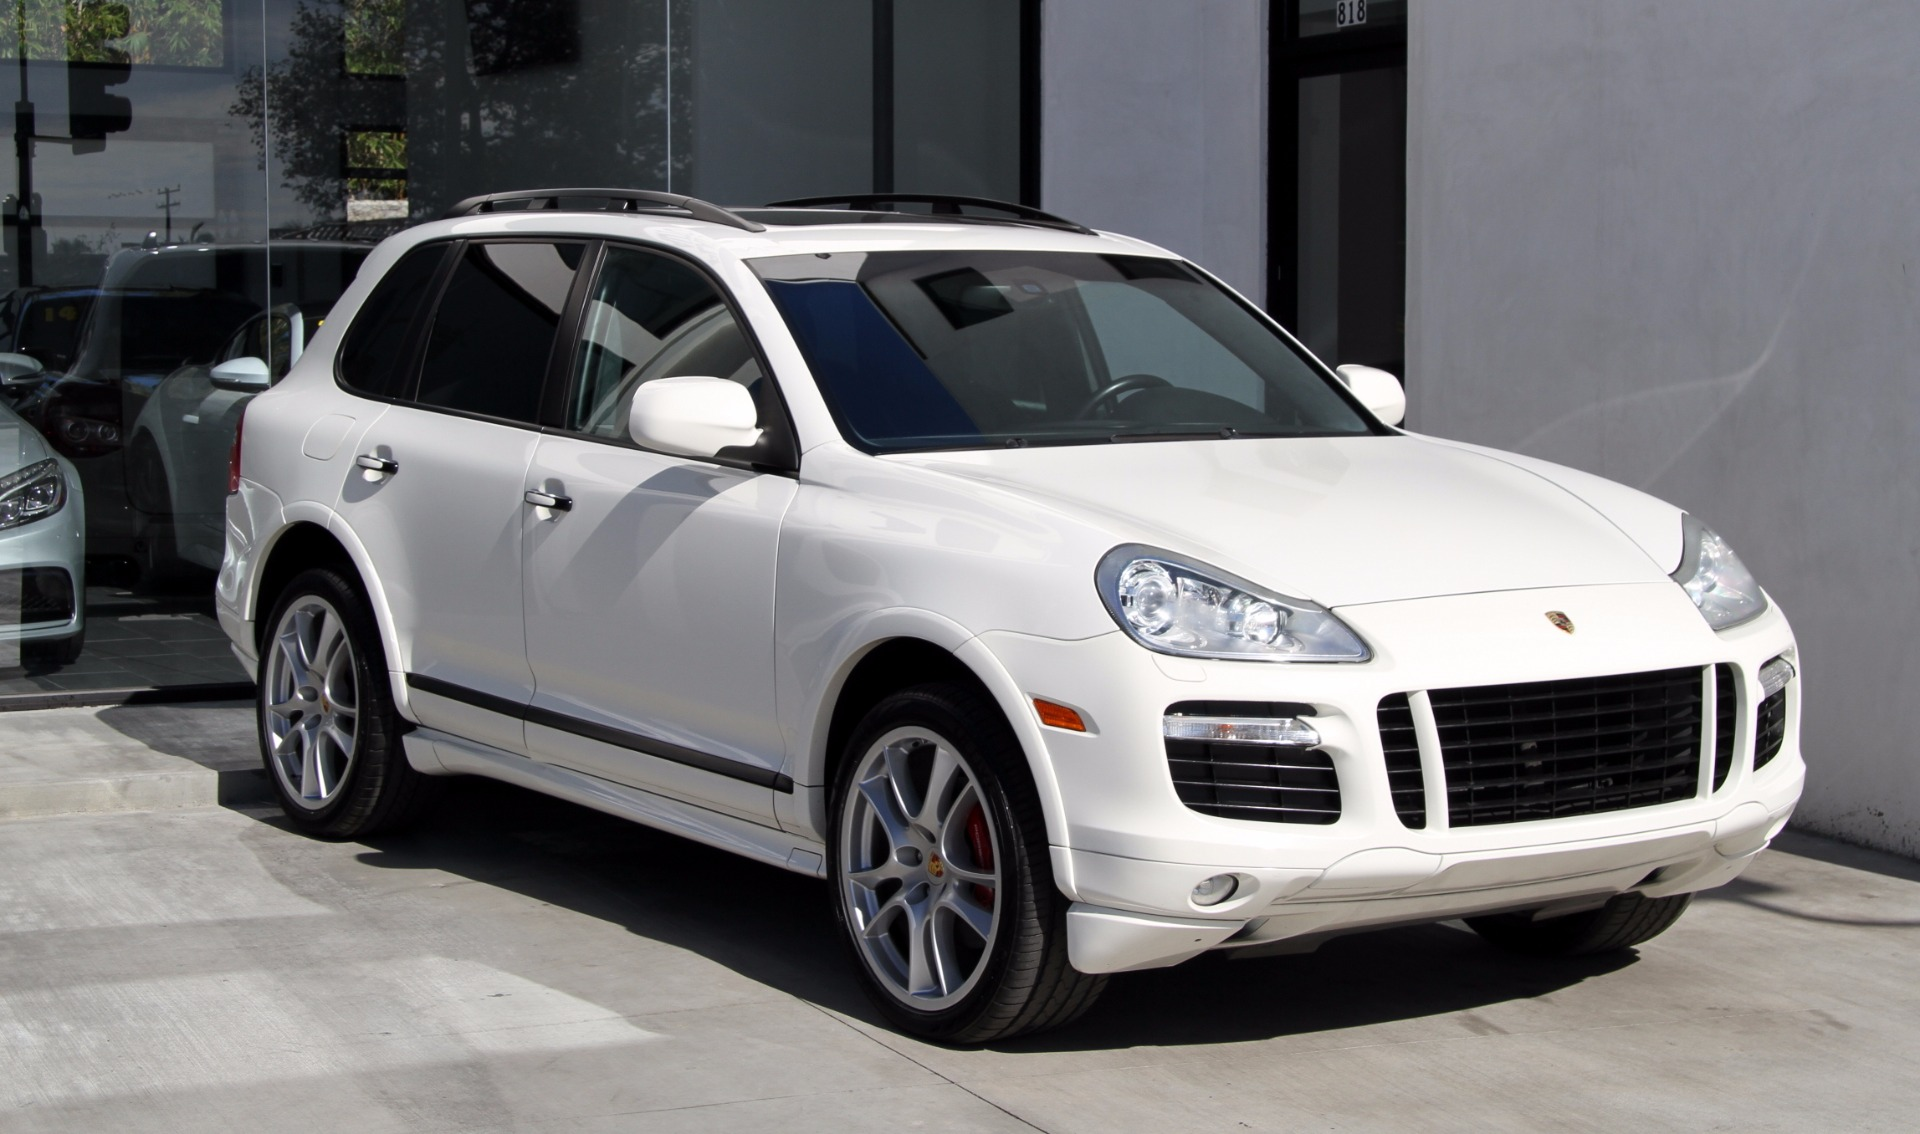 Suv Floor Mats >> 2009 Porsche Cayenne GTS Stock # 6024 for sale near ...